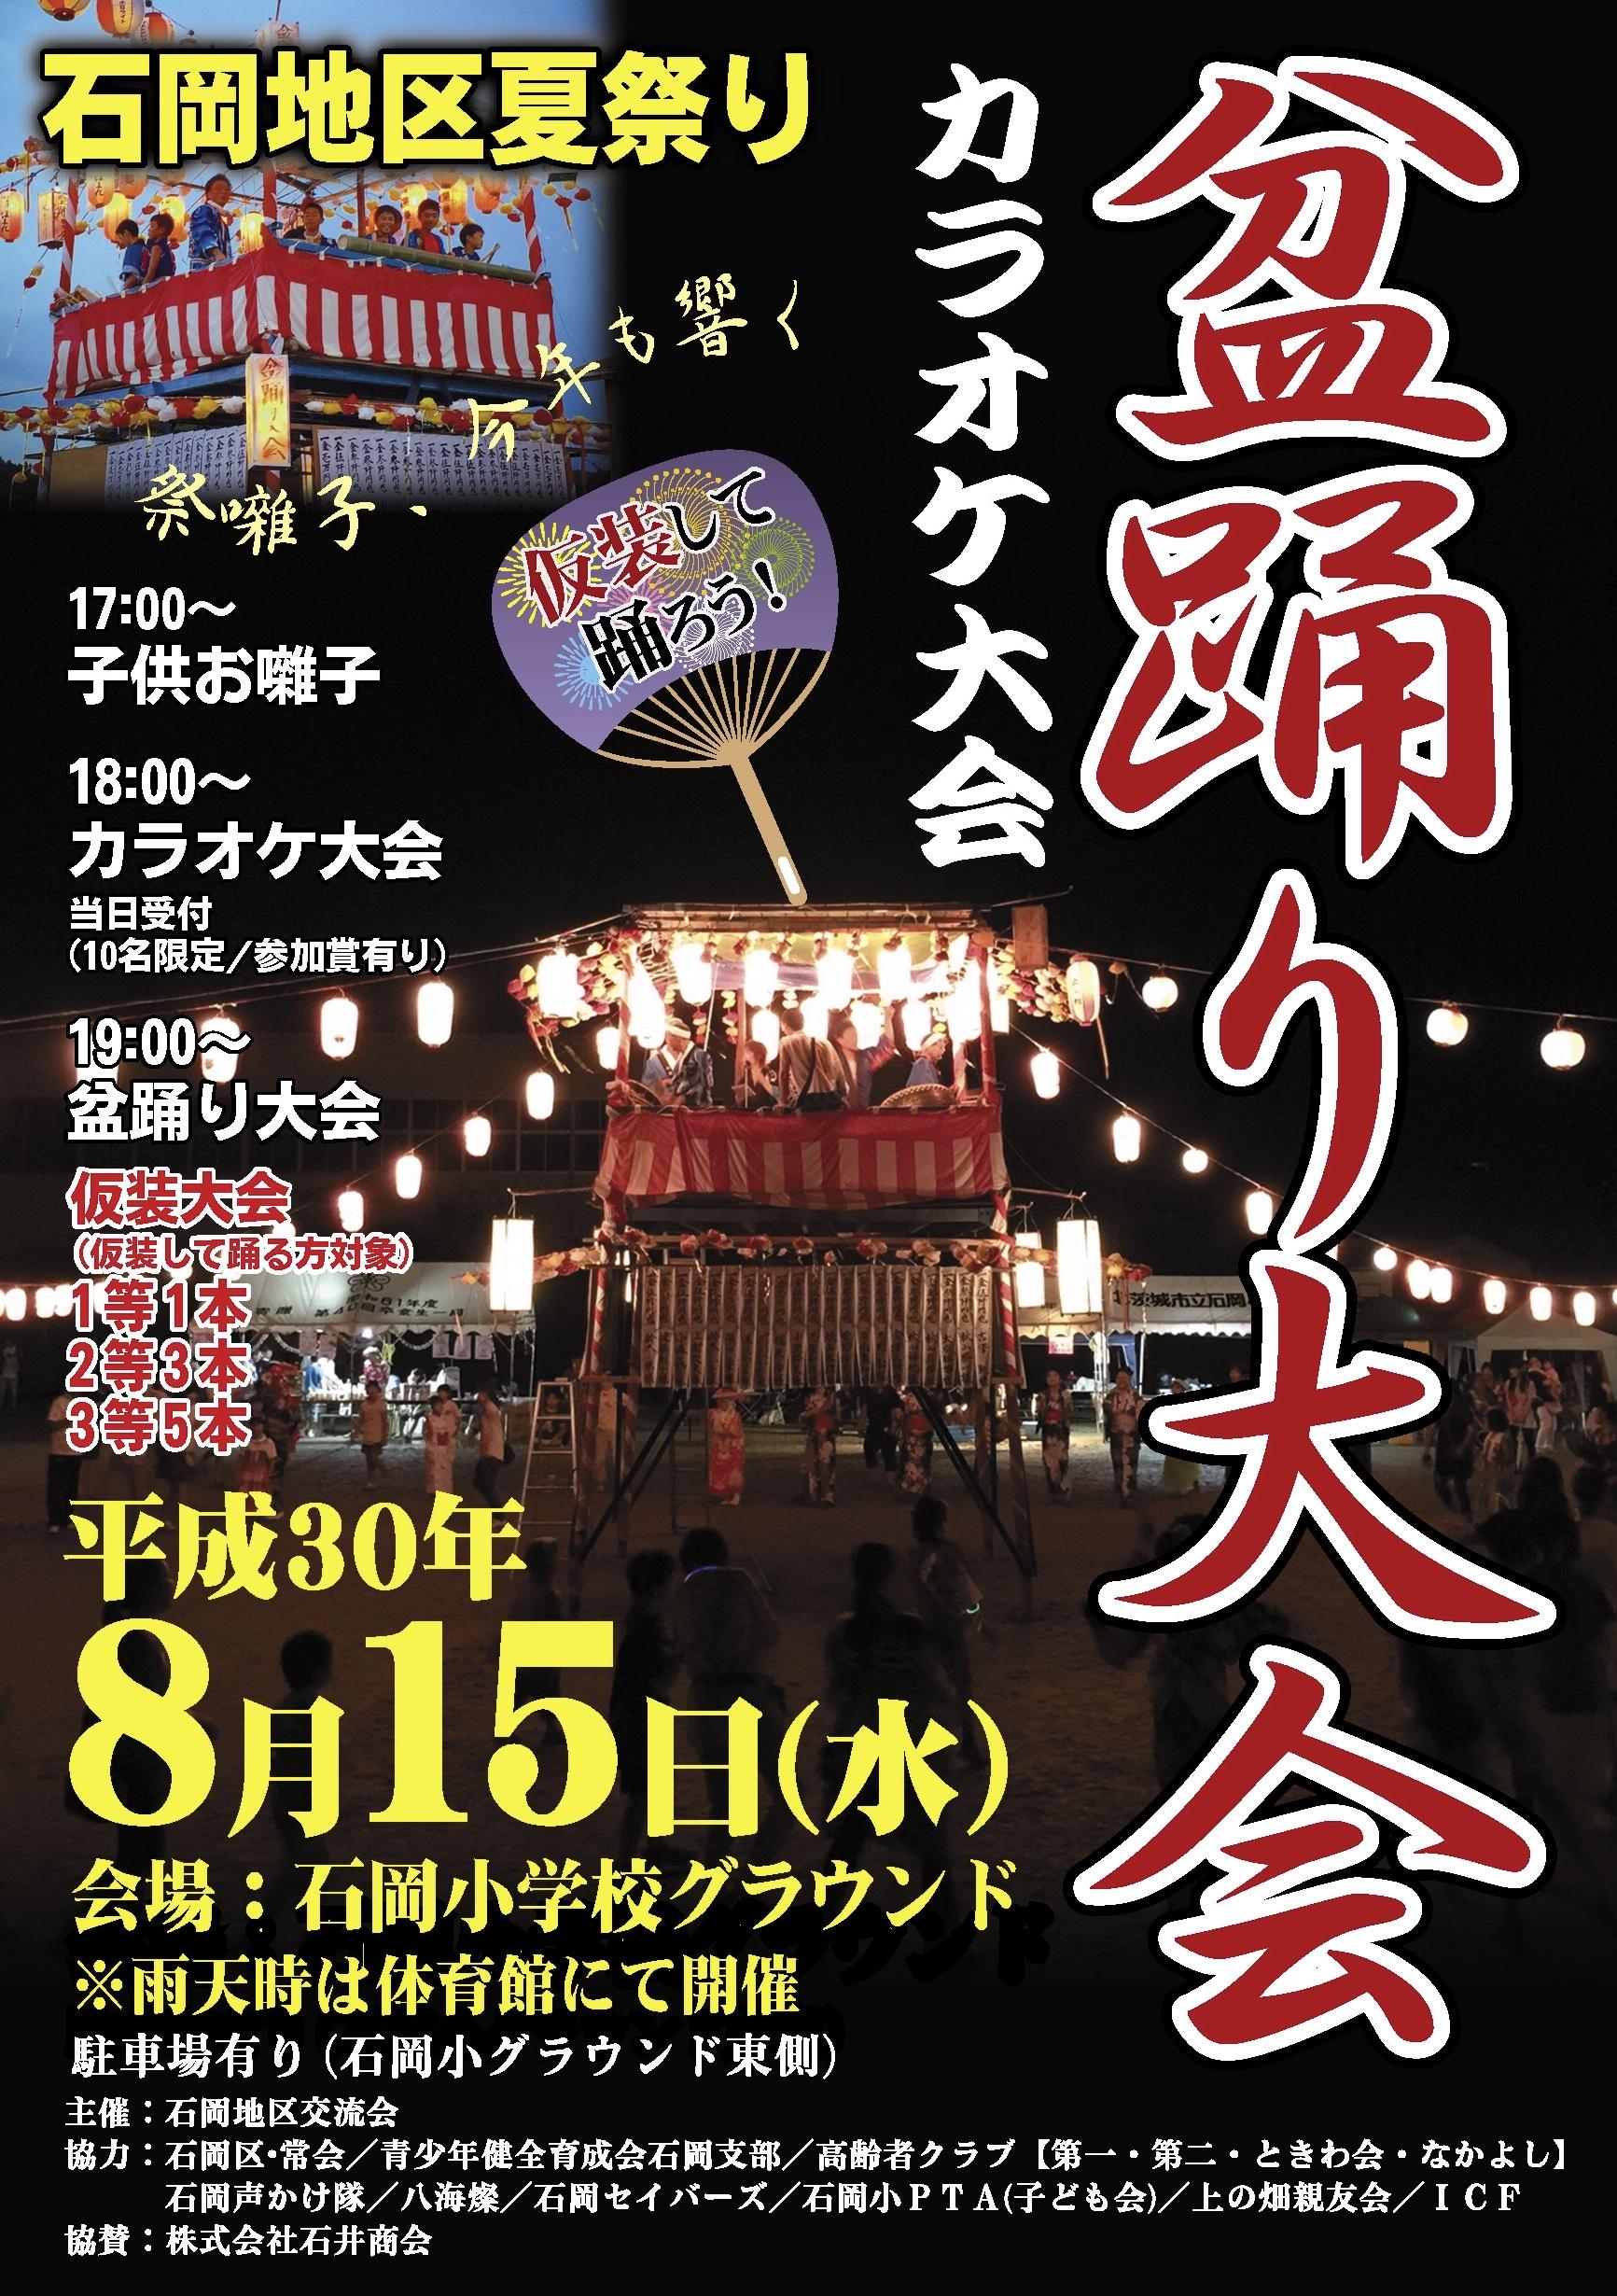 石岡地区 夏祭り盆踊り大会 2018